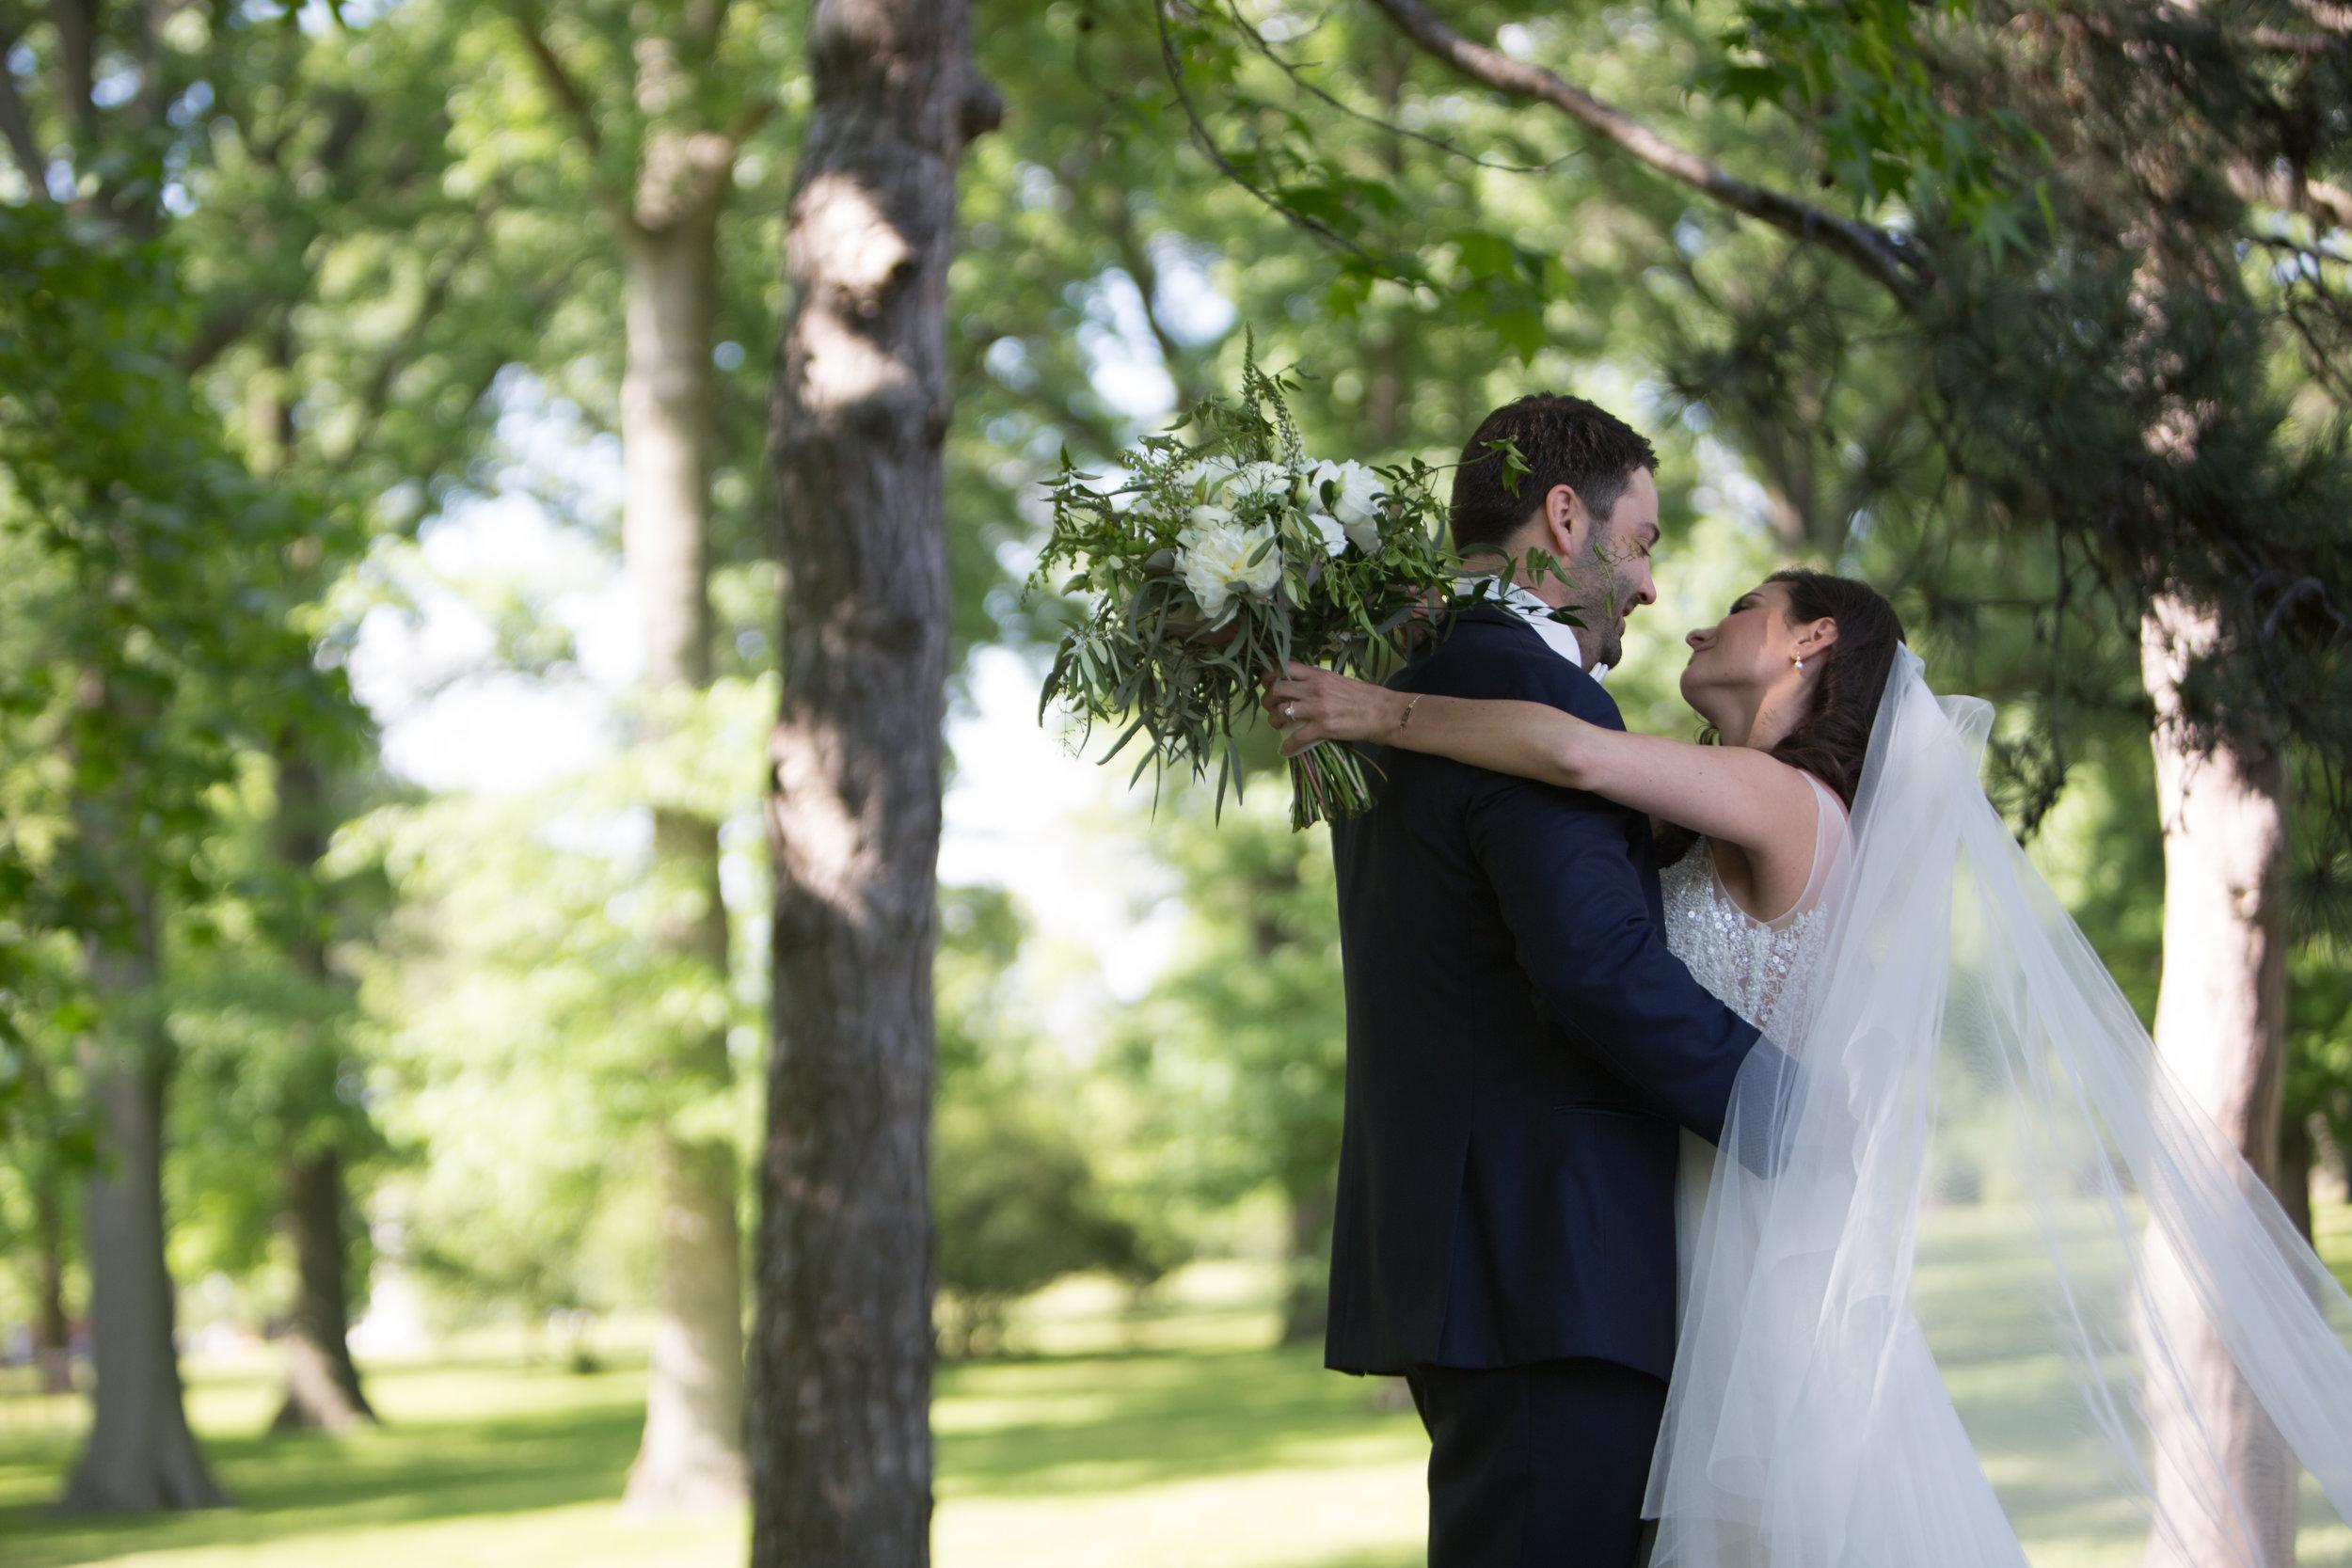 St. Louis Photographer St. Charles Photographer Engagement Wedding Photographer (25).jpg